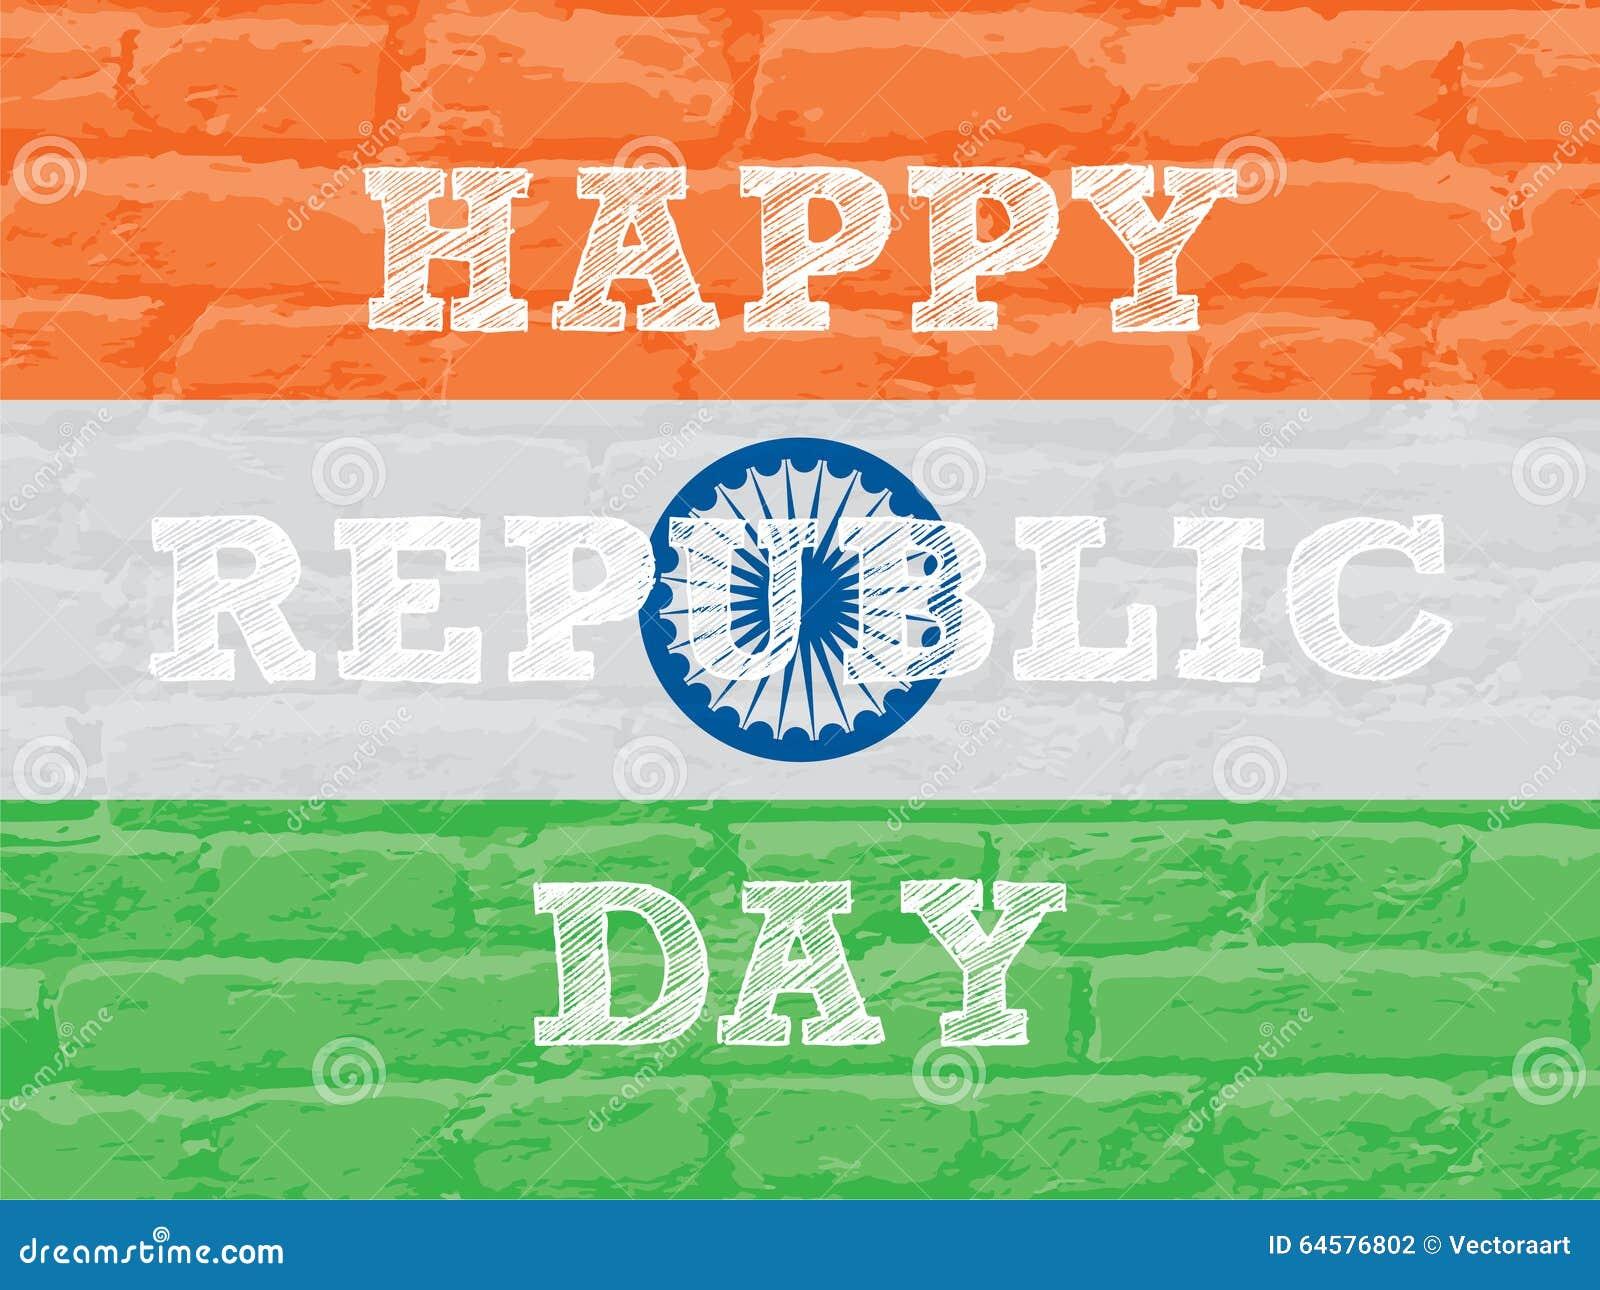 Happy republic day greeting design stock vector illustration of happy republic day greeting design m4hsunfo